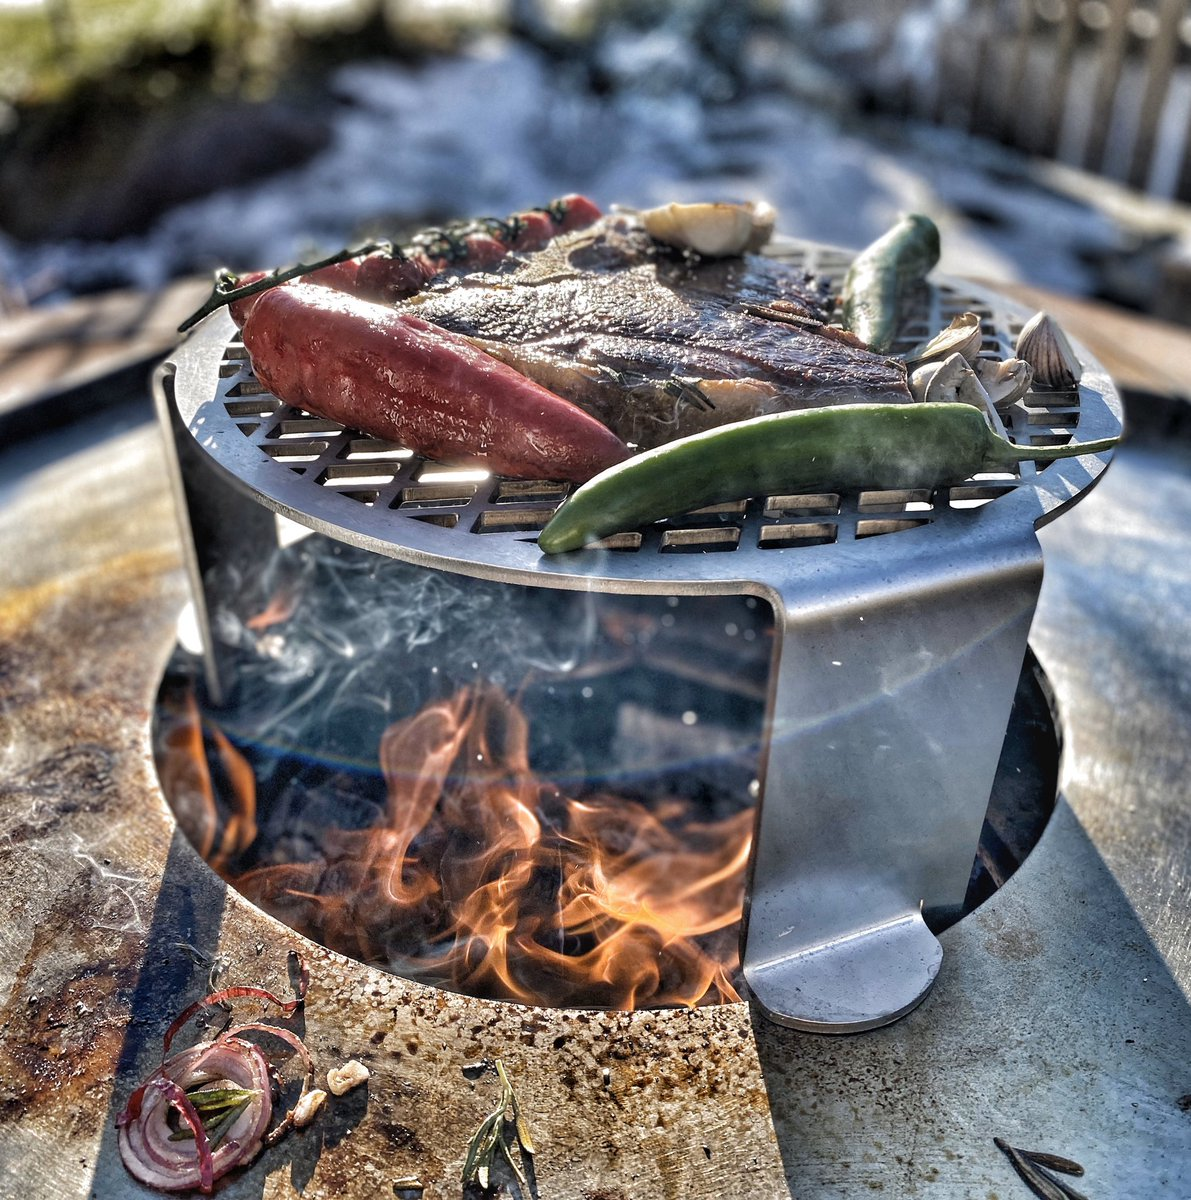 #equipment #martinkainer #designgrill #martinkainerdesigngrill #bbq #direct #grilling #grill #directgrilling #picoftheday #pictureoftheday #bestoftheday #instafood #instagood #instachallenge #challenge #photooftheday #zillertal #tyrol #alps #food #foodphotography